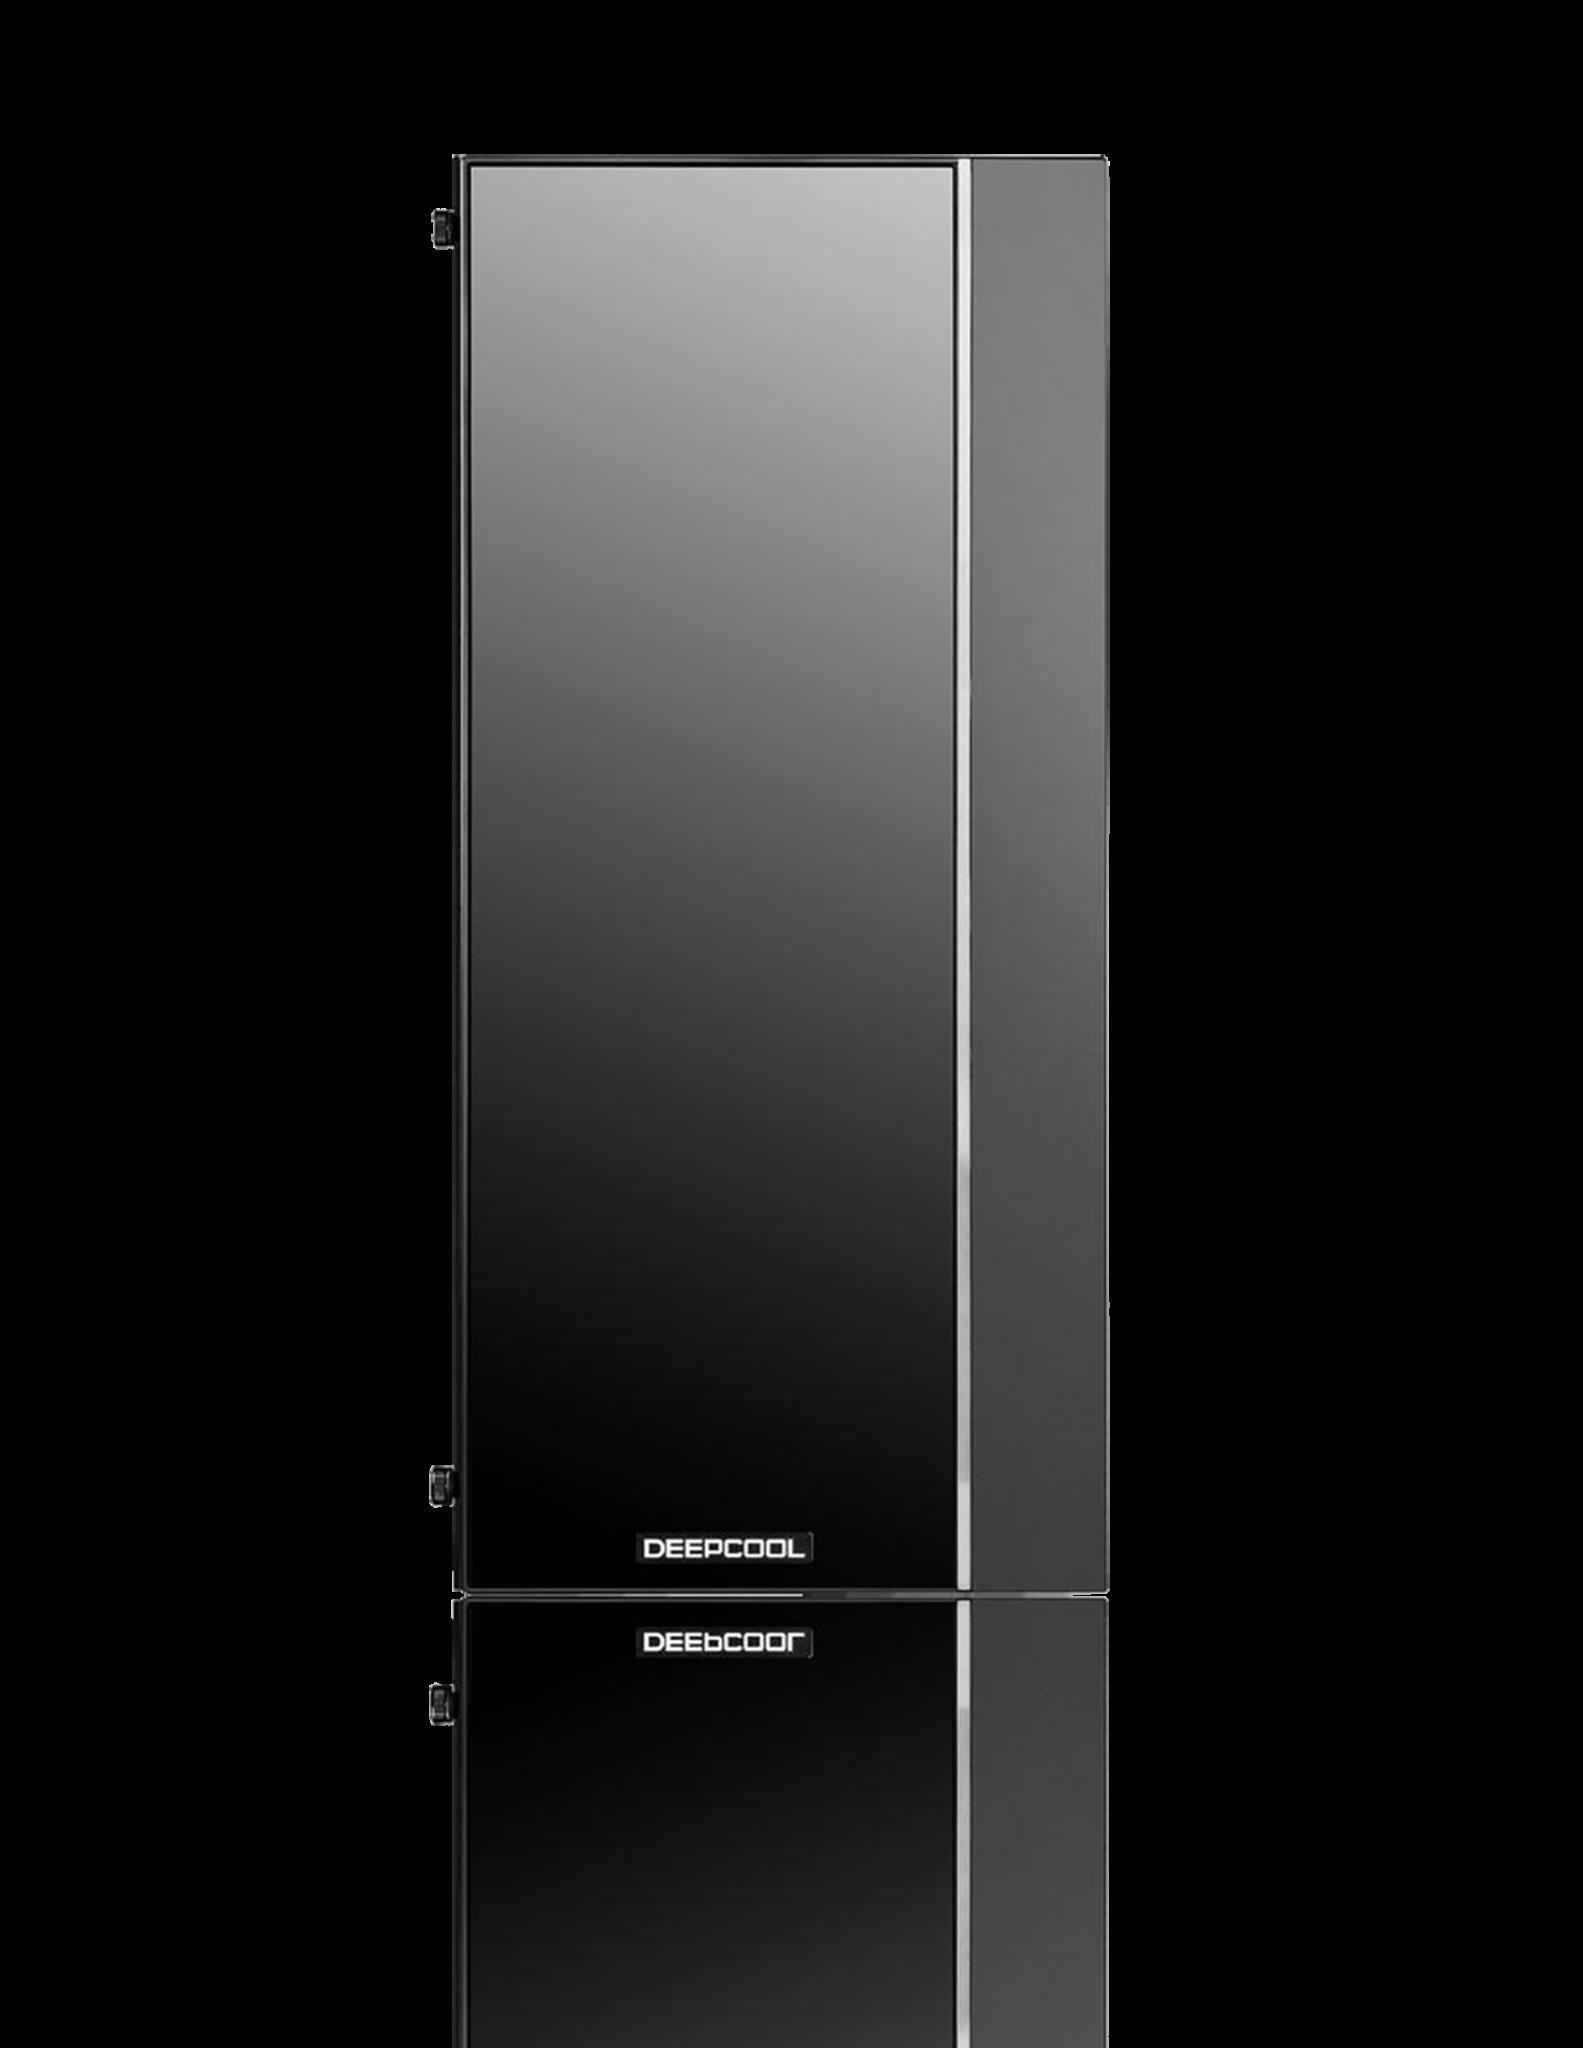 LYTE Emperor PC - Ryzen 3 | RX 570 | 8GB RAM | 128GB SSD | A320 Motherboard